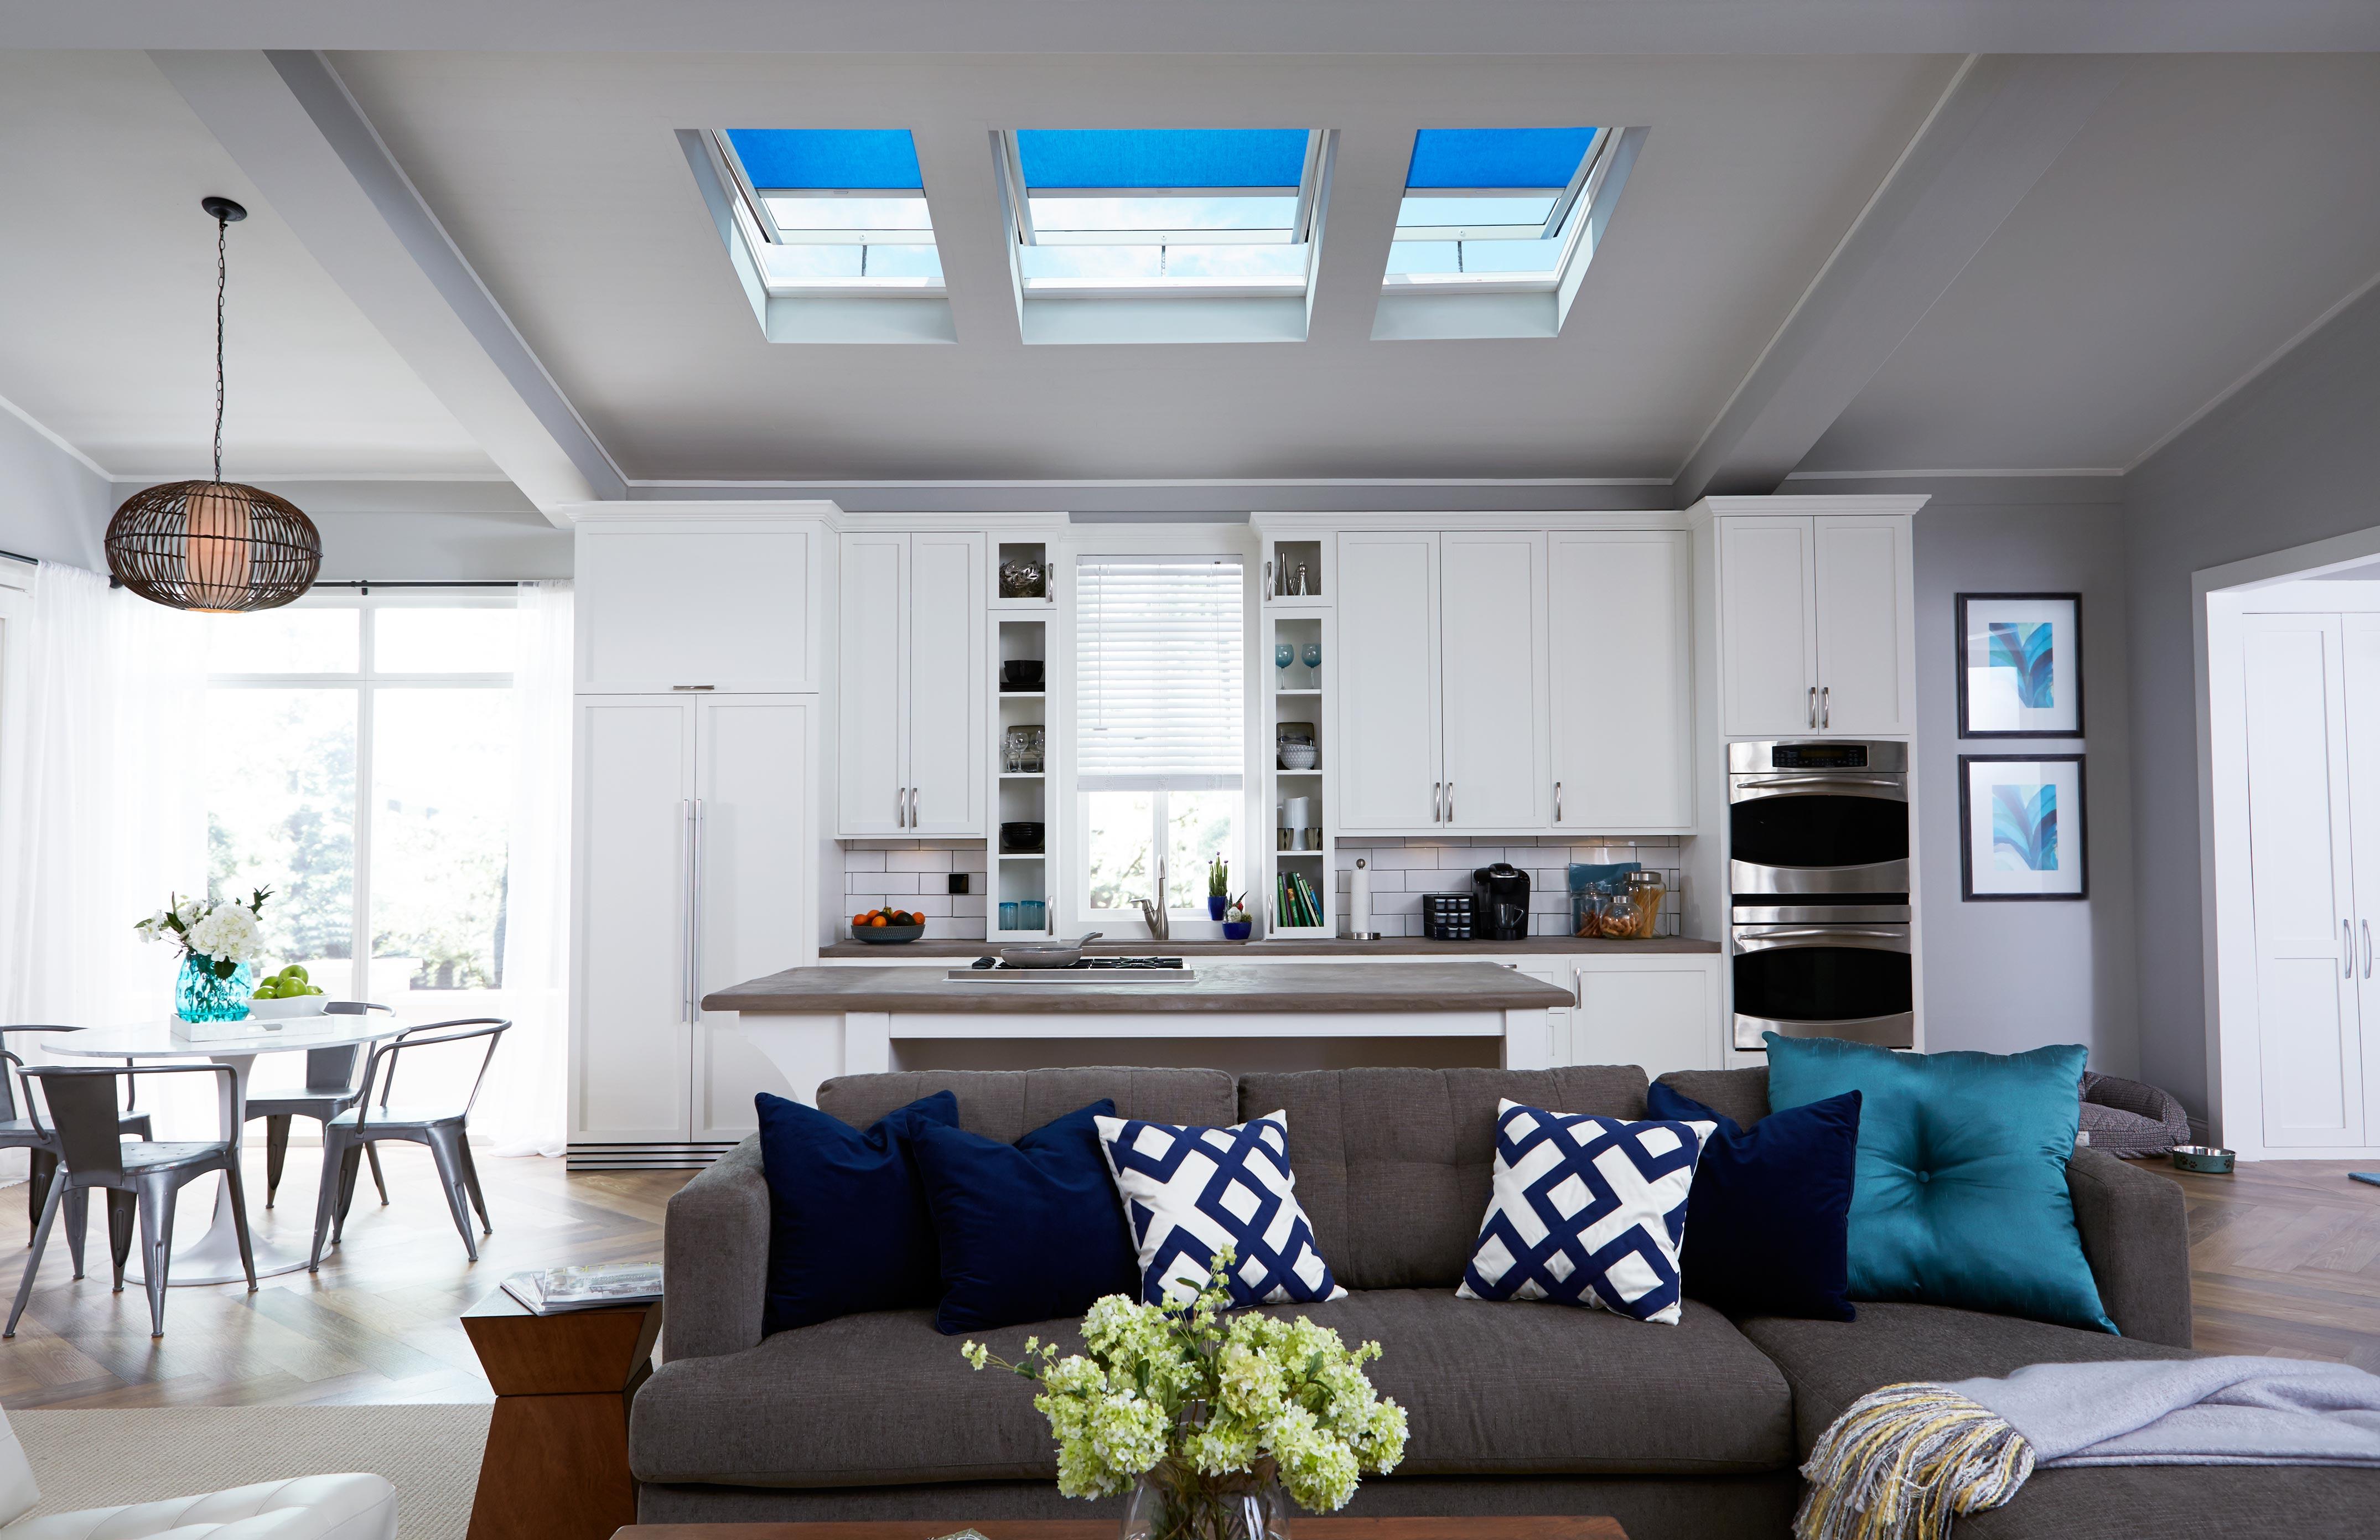 Velux news release blinds energy efficiency for Skylight home